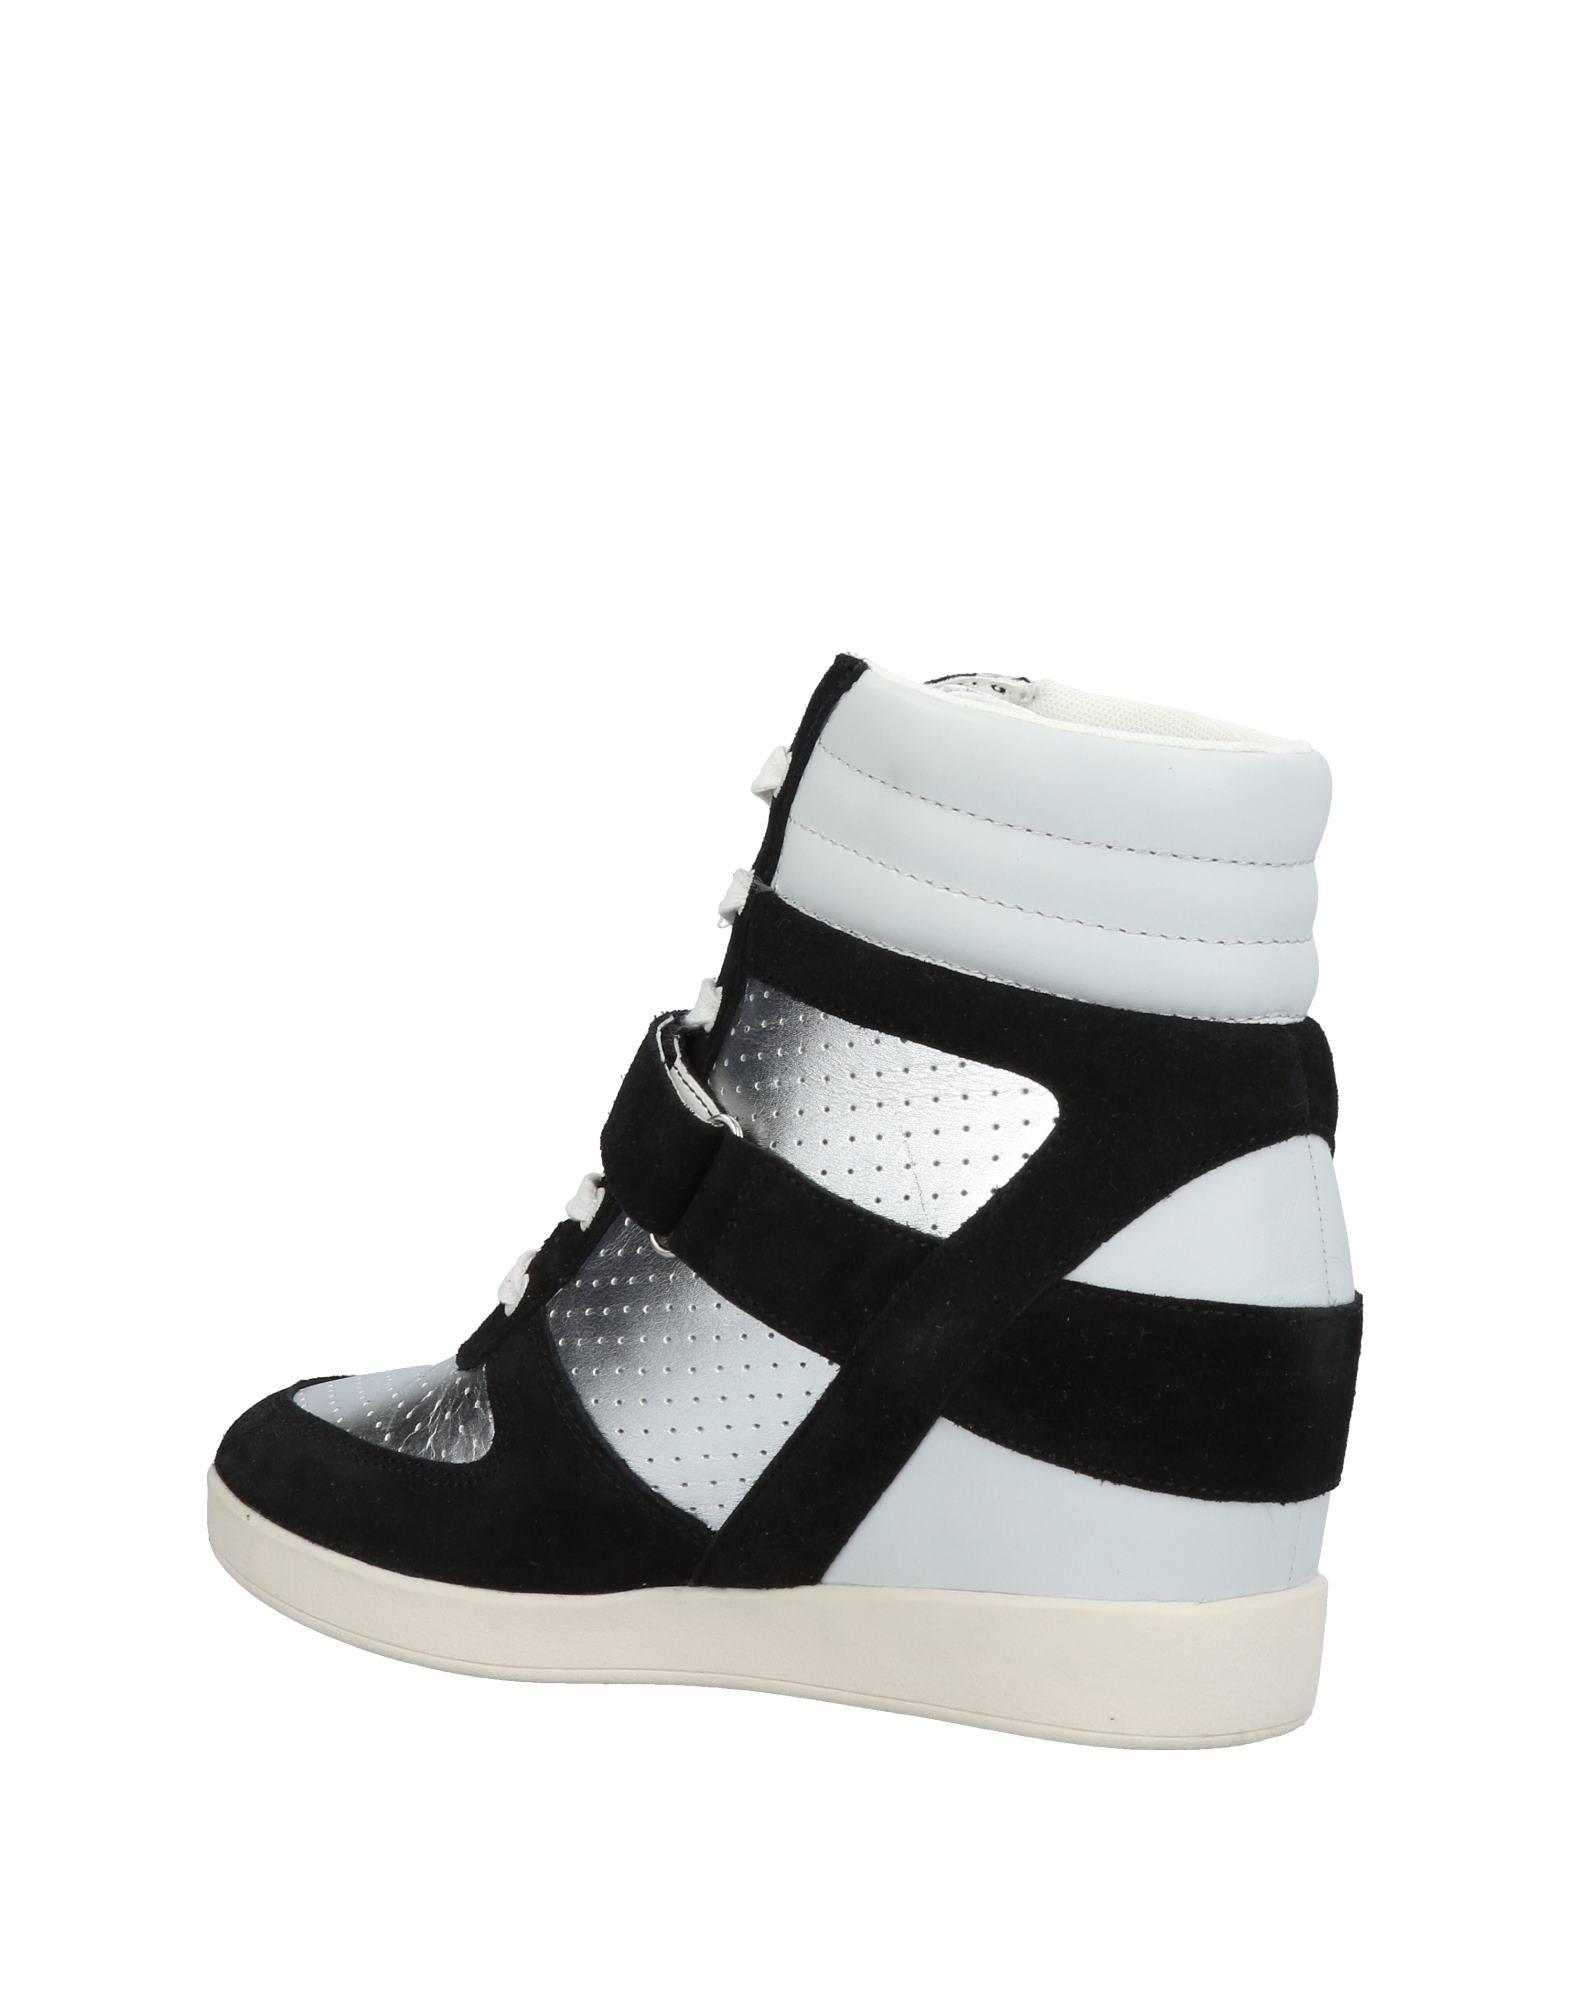 Sneakers Armani Jeans Donna Donna Jeans - 11182617SR 0ead1d